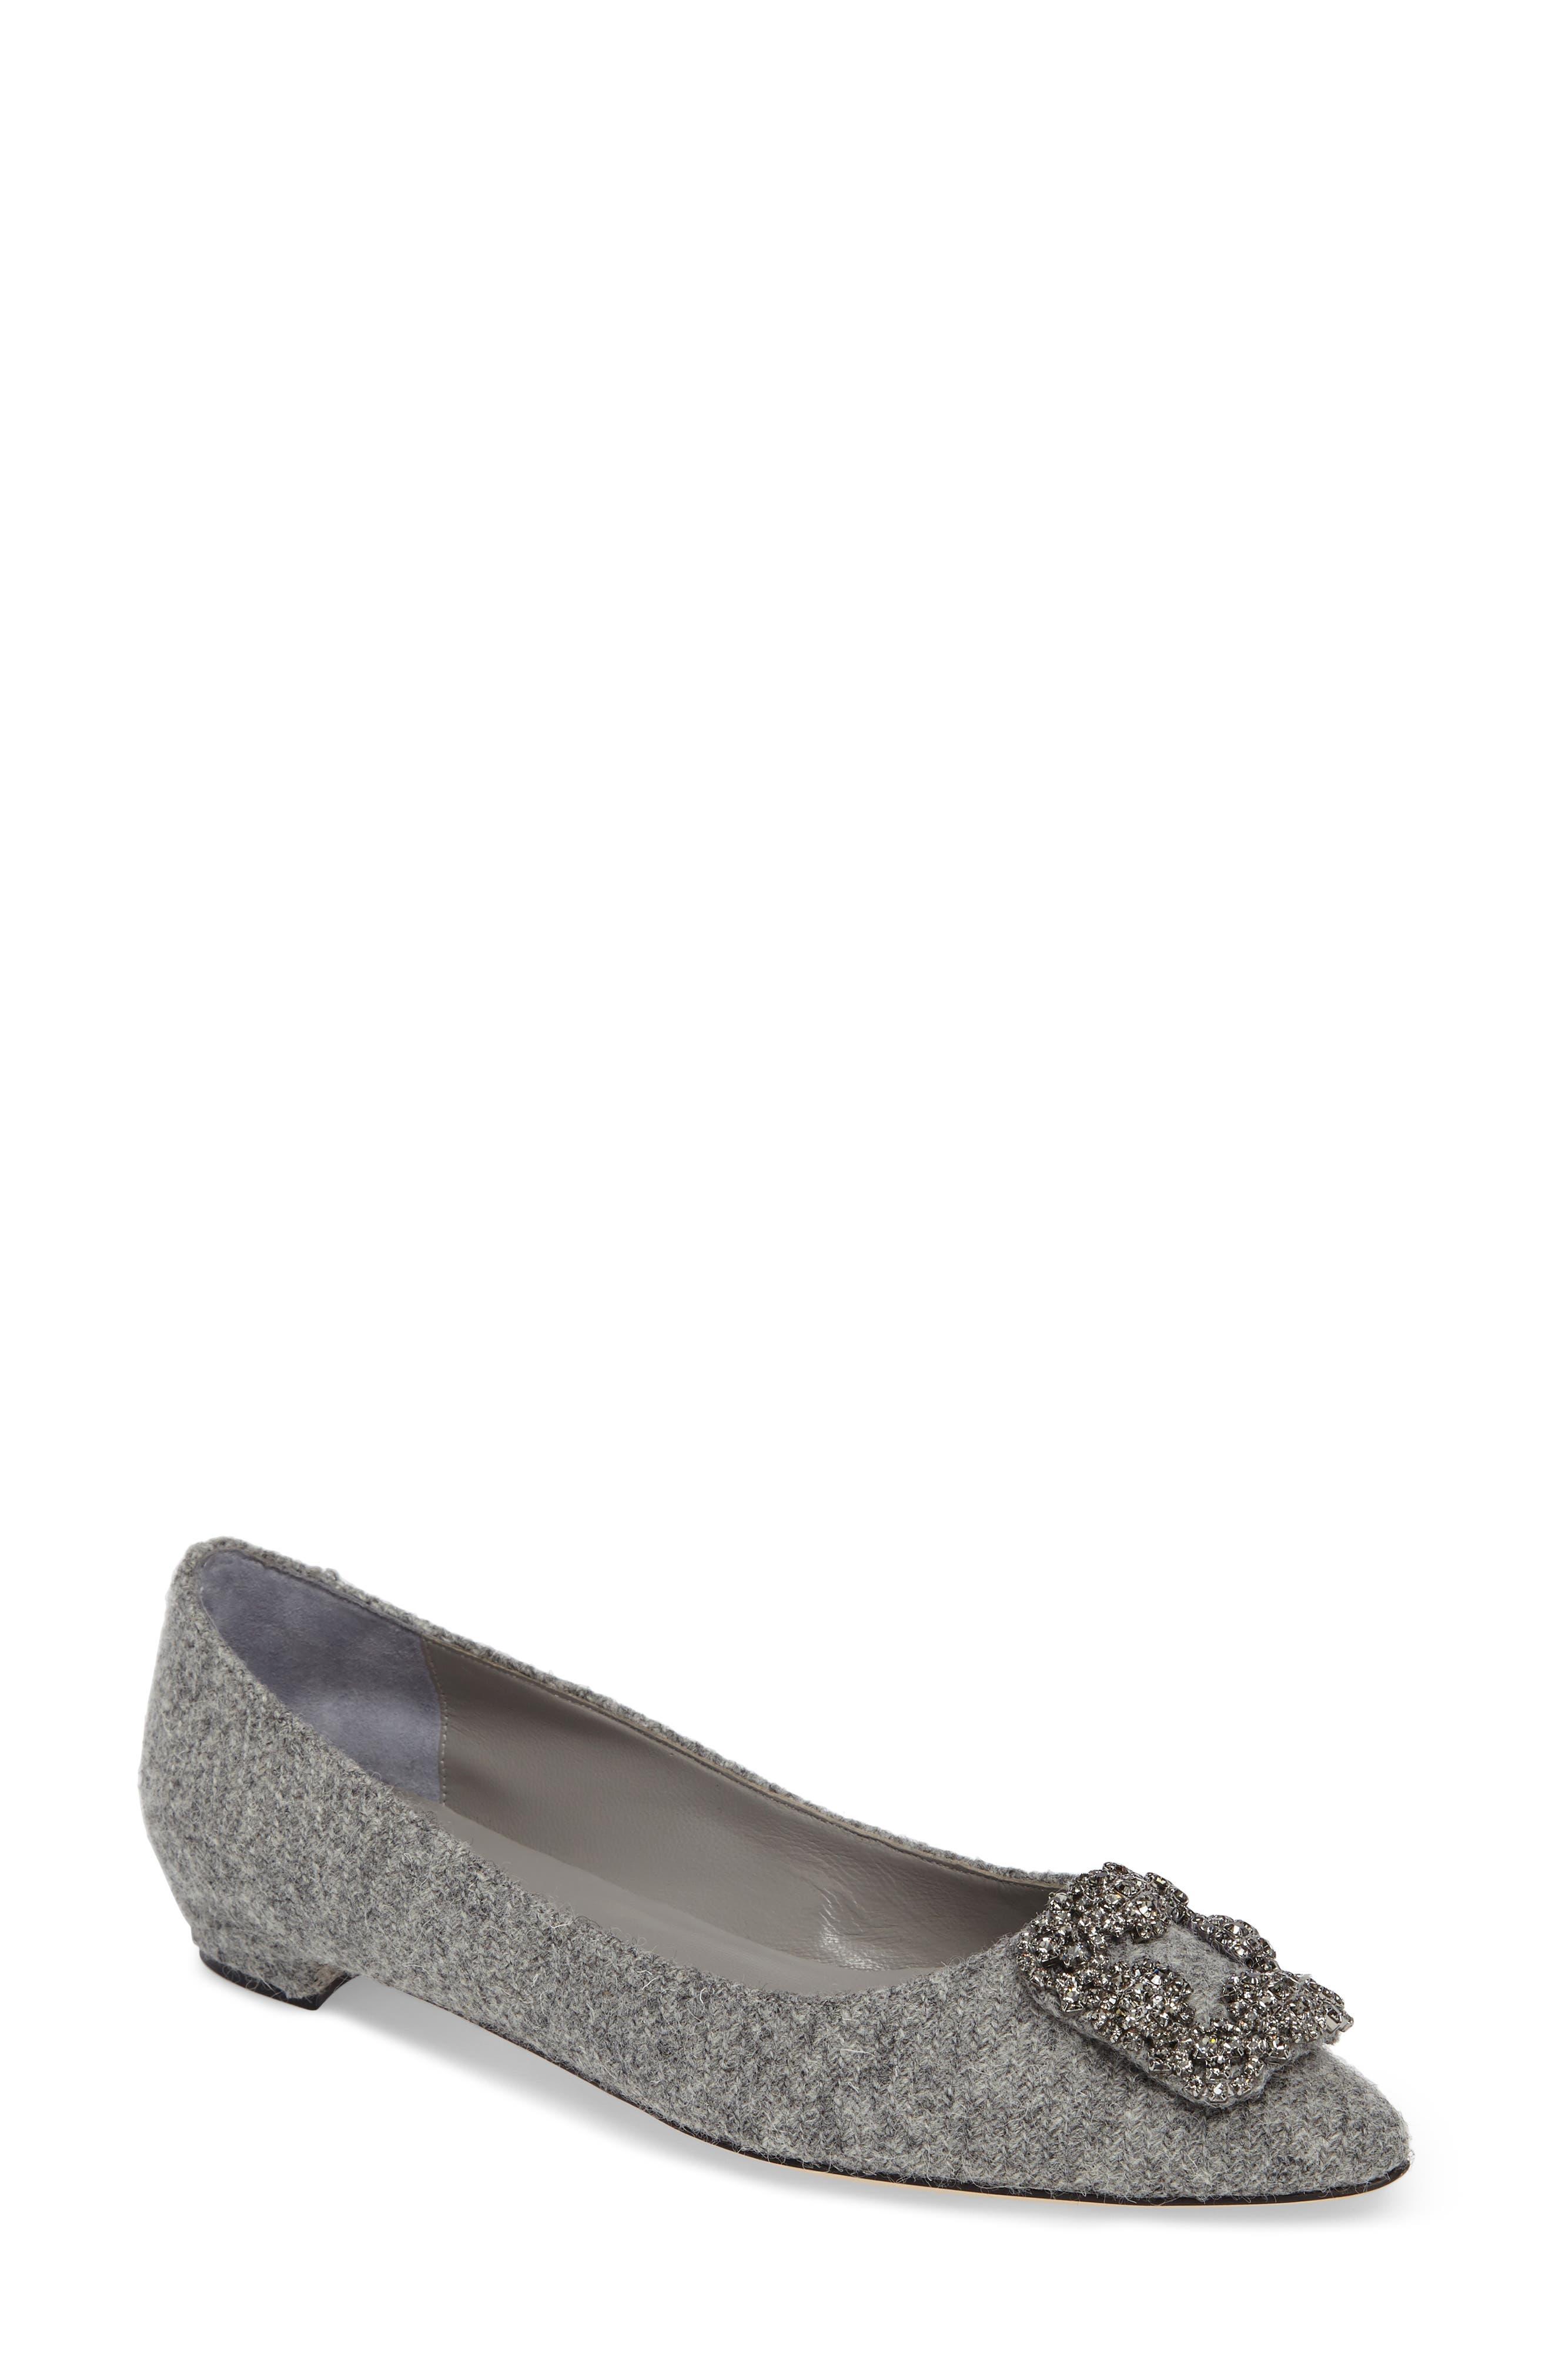 Main Image - Manolo Blahnik 'Hangisi' Jeweled Pointy Toe Flat (Women)